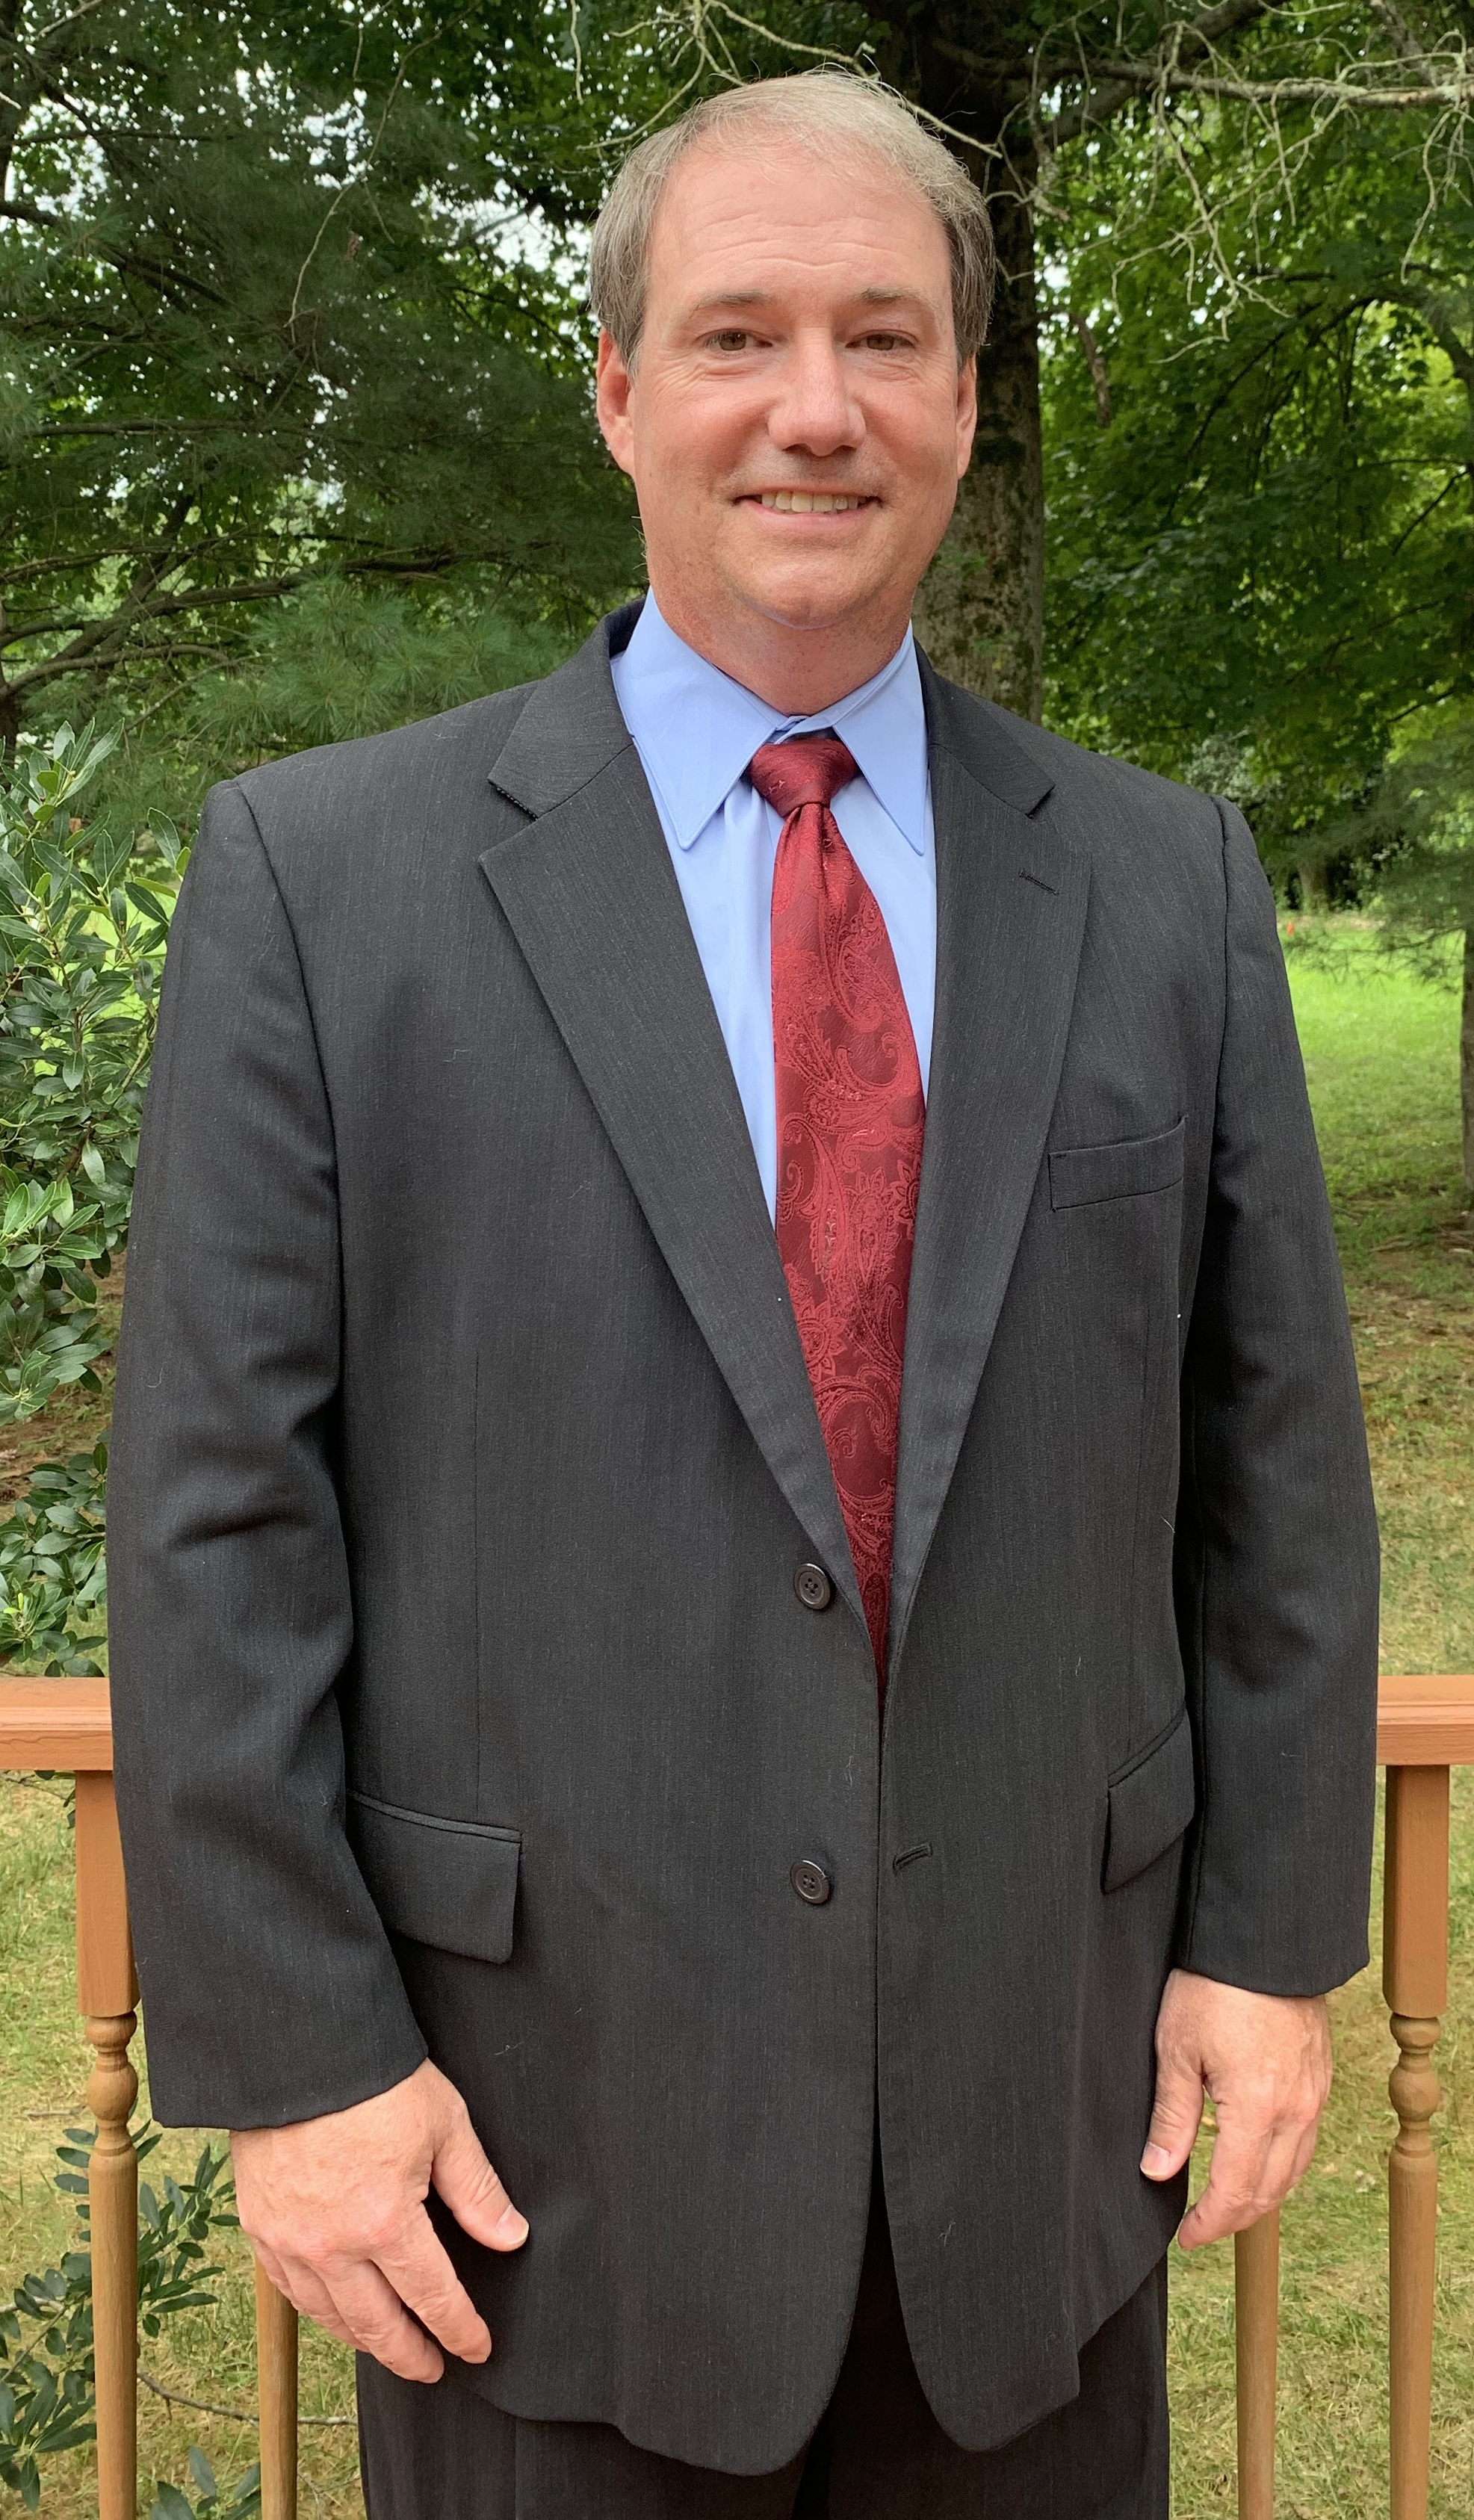 Jim Sullivan- MS, MBA and IBM Master Instructor